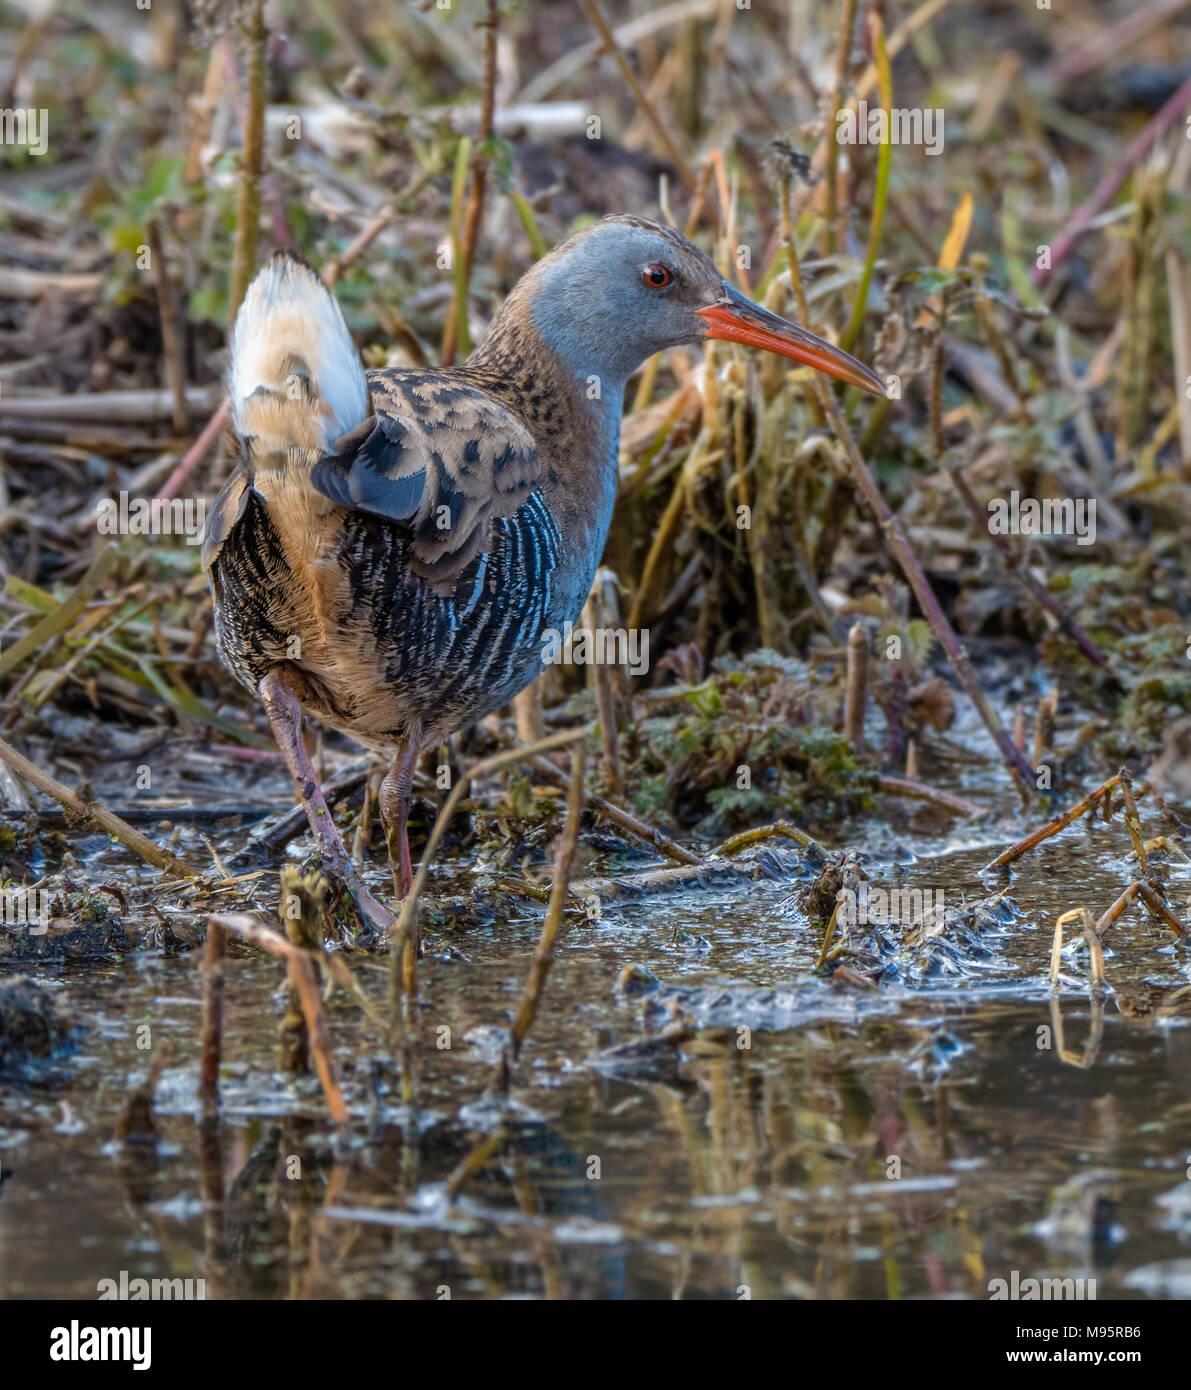 Water rail Rallus aquaticus a shy and secretive European wetland bird - Gloucestershire UK - Stock Image